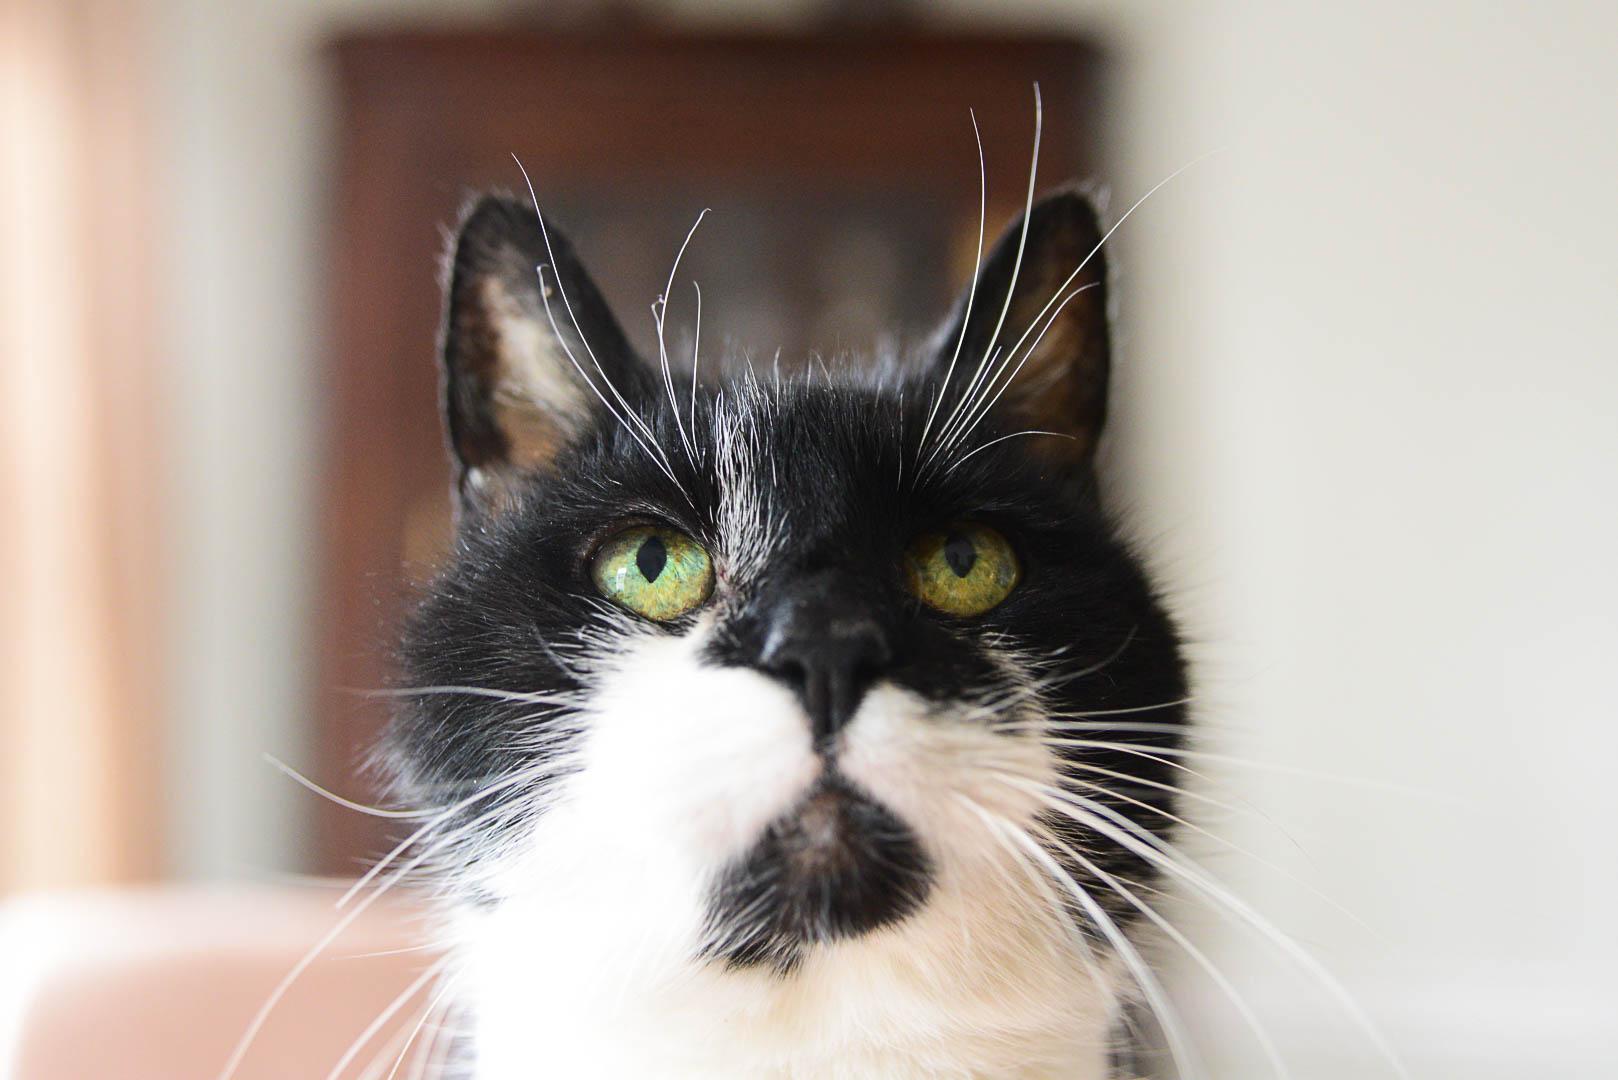 fezzie the cat